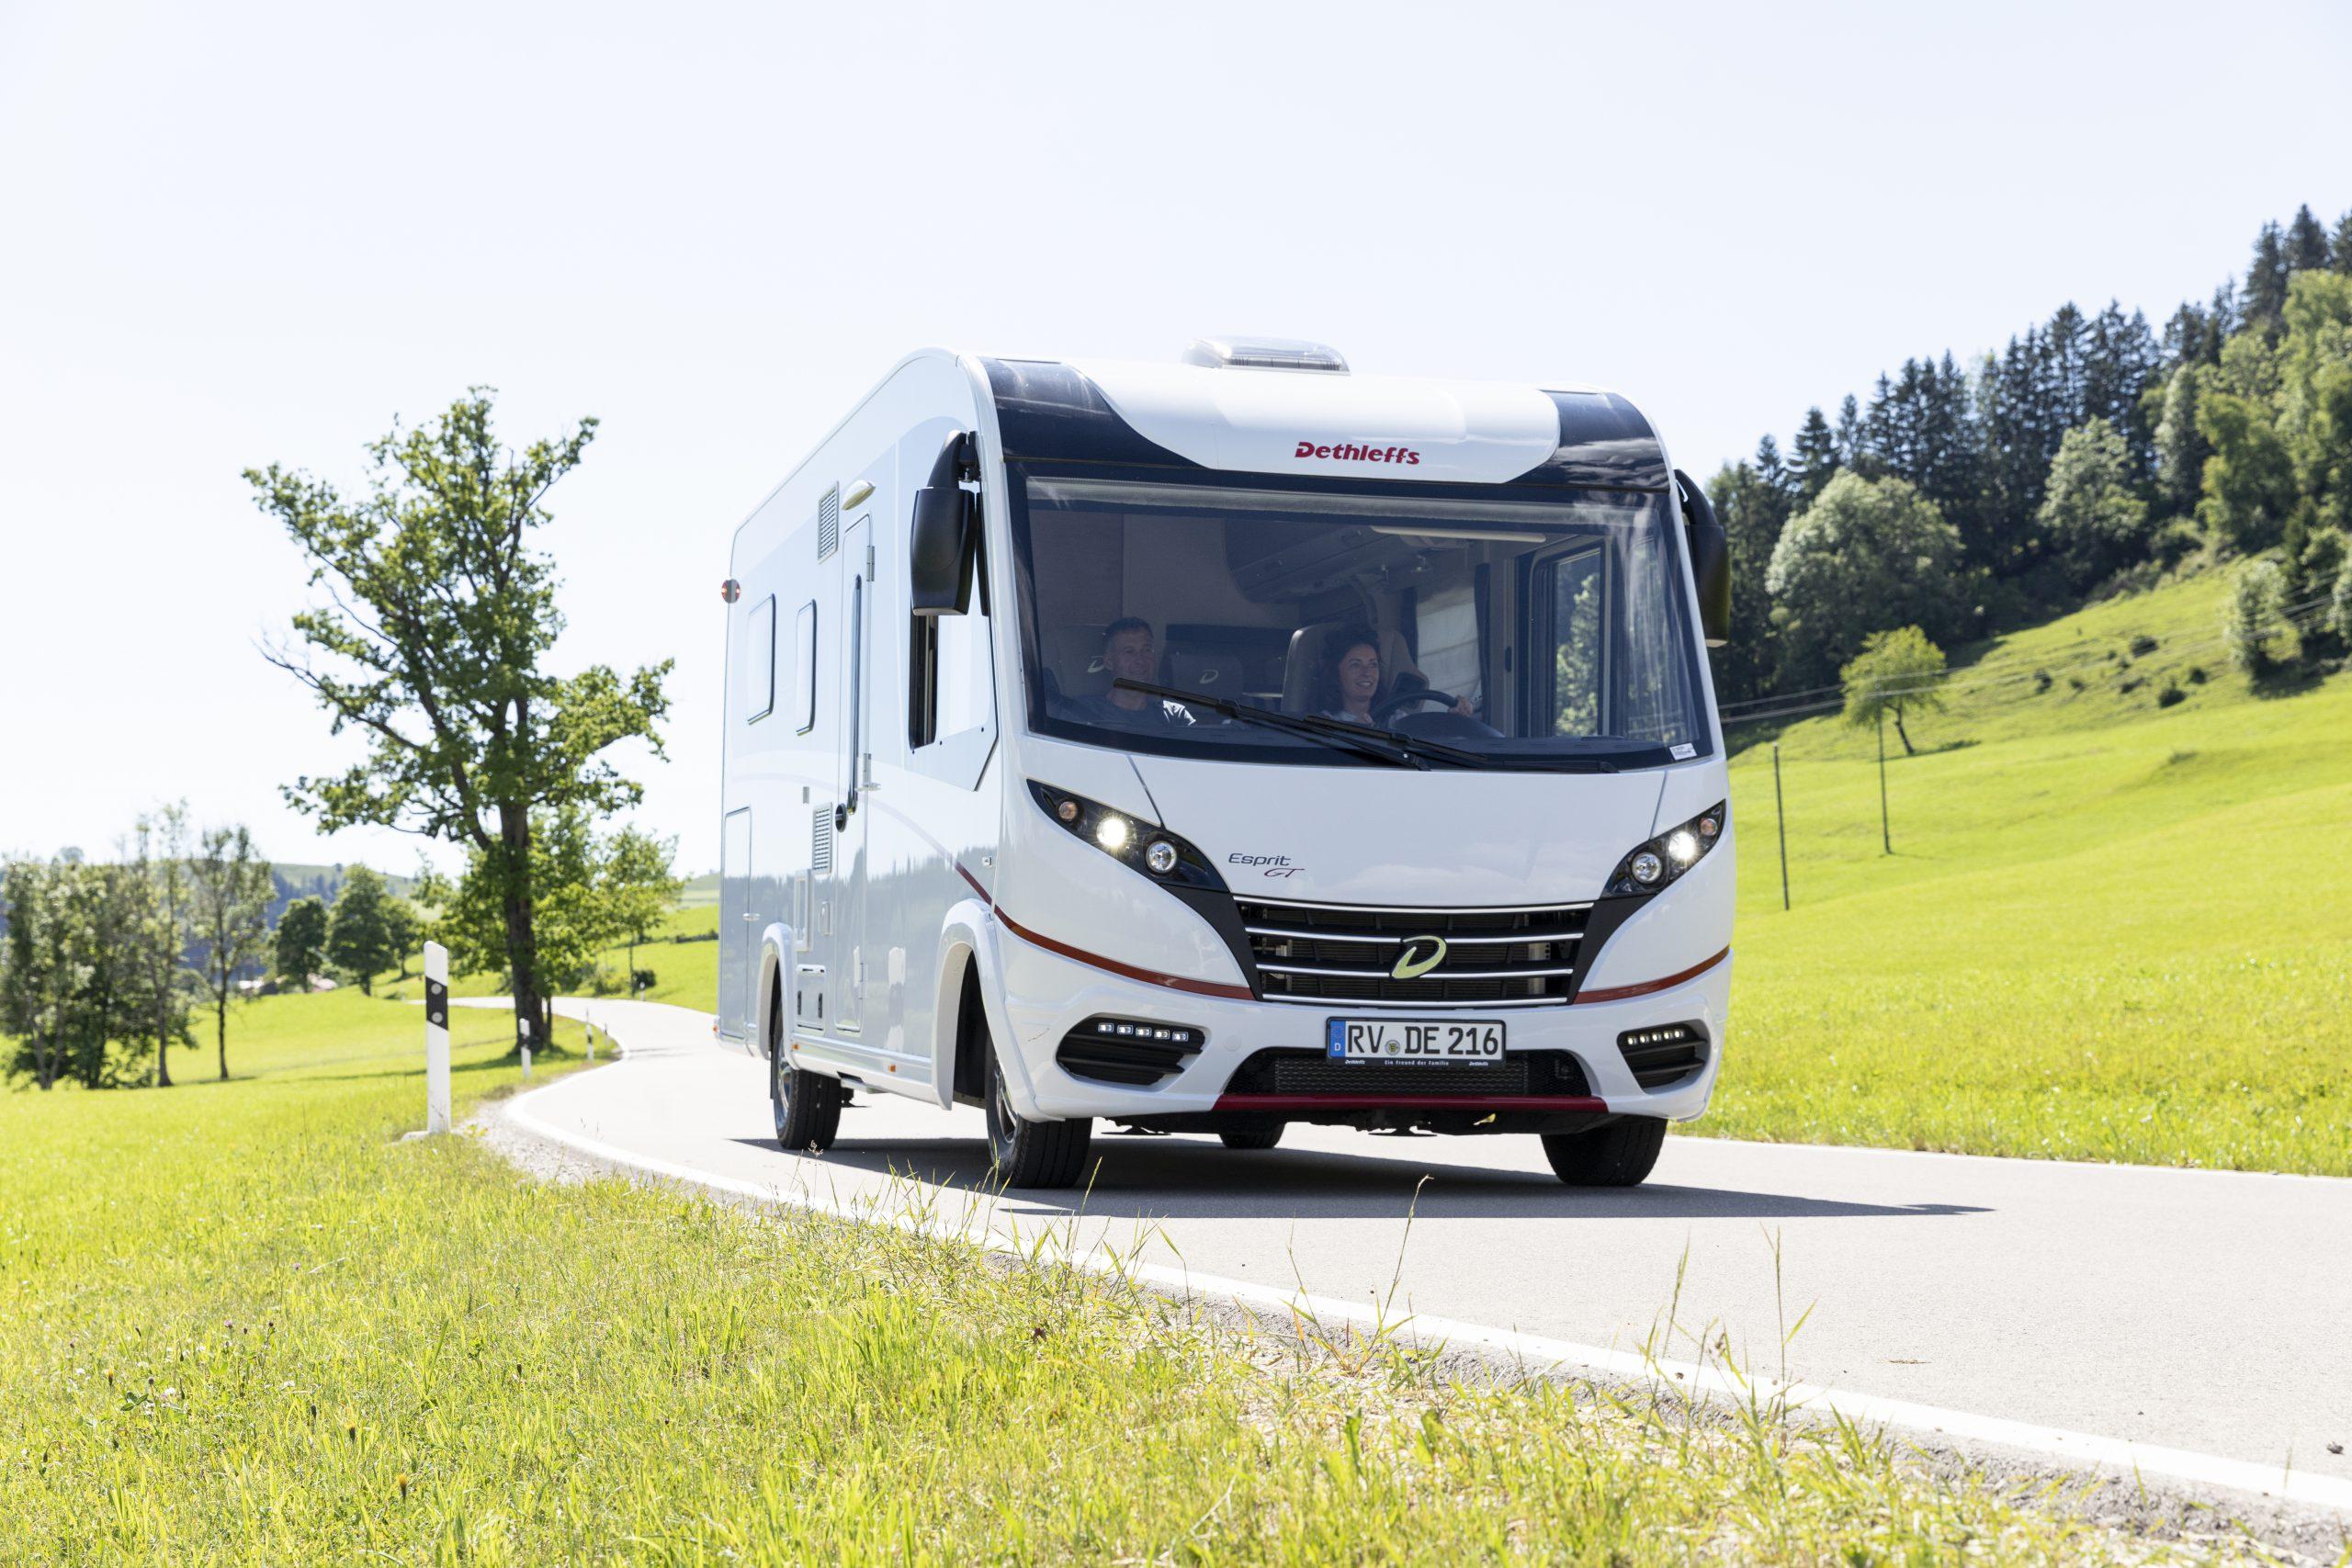 campers, camper kopen, camper kopen Roosendaal, kampeerauto, kampeerauto's, camper kopen Noord Brabant